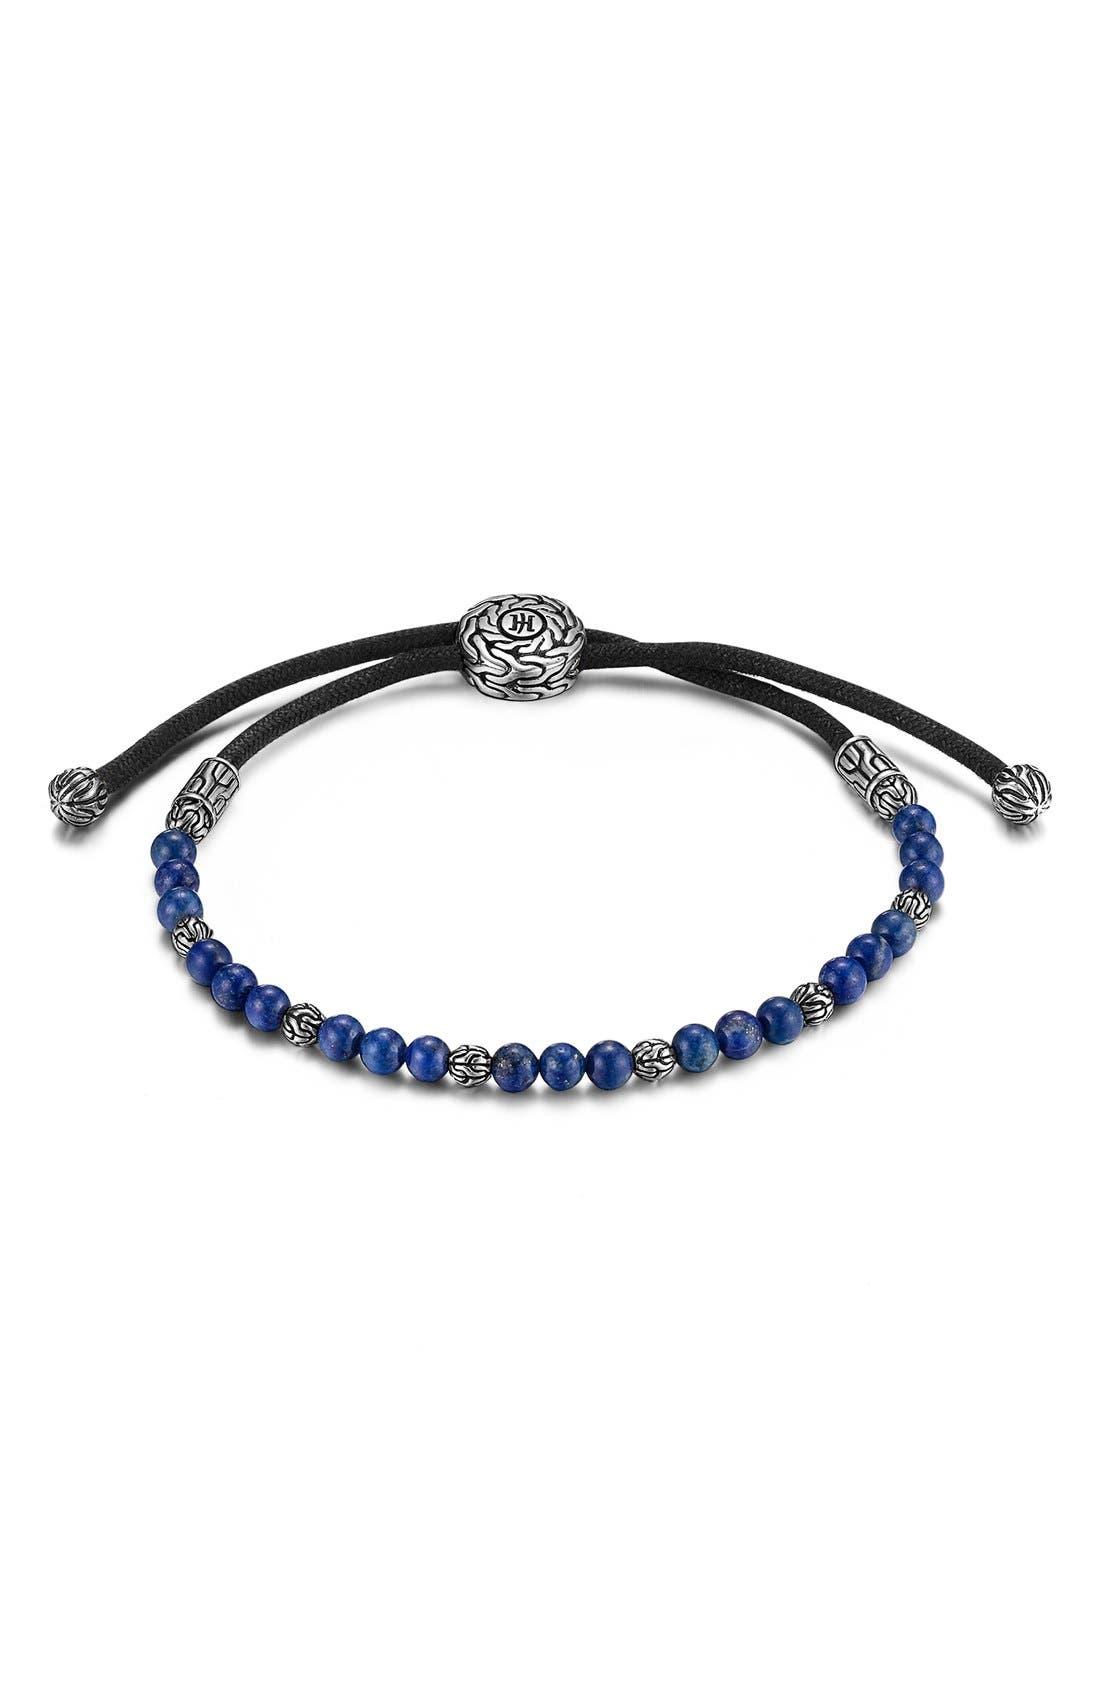 John Hardy 'Classic Chain' Beaded Friendship Bracelet